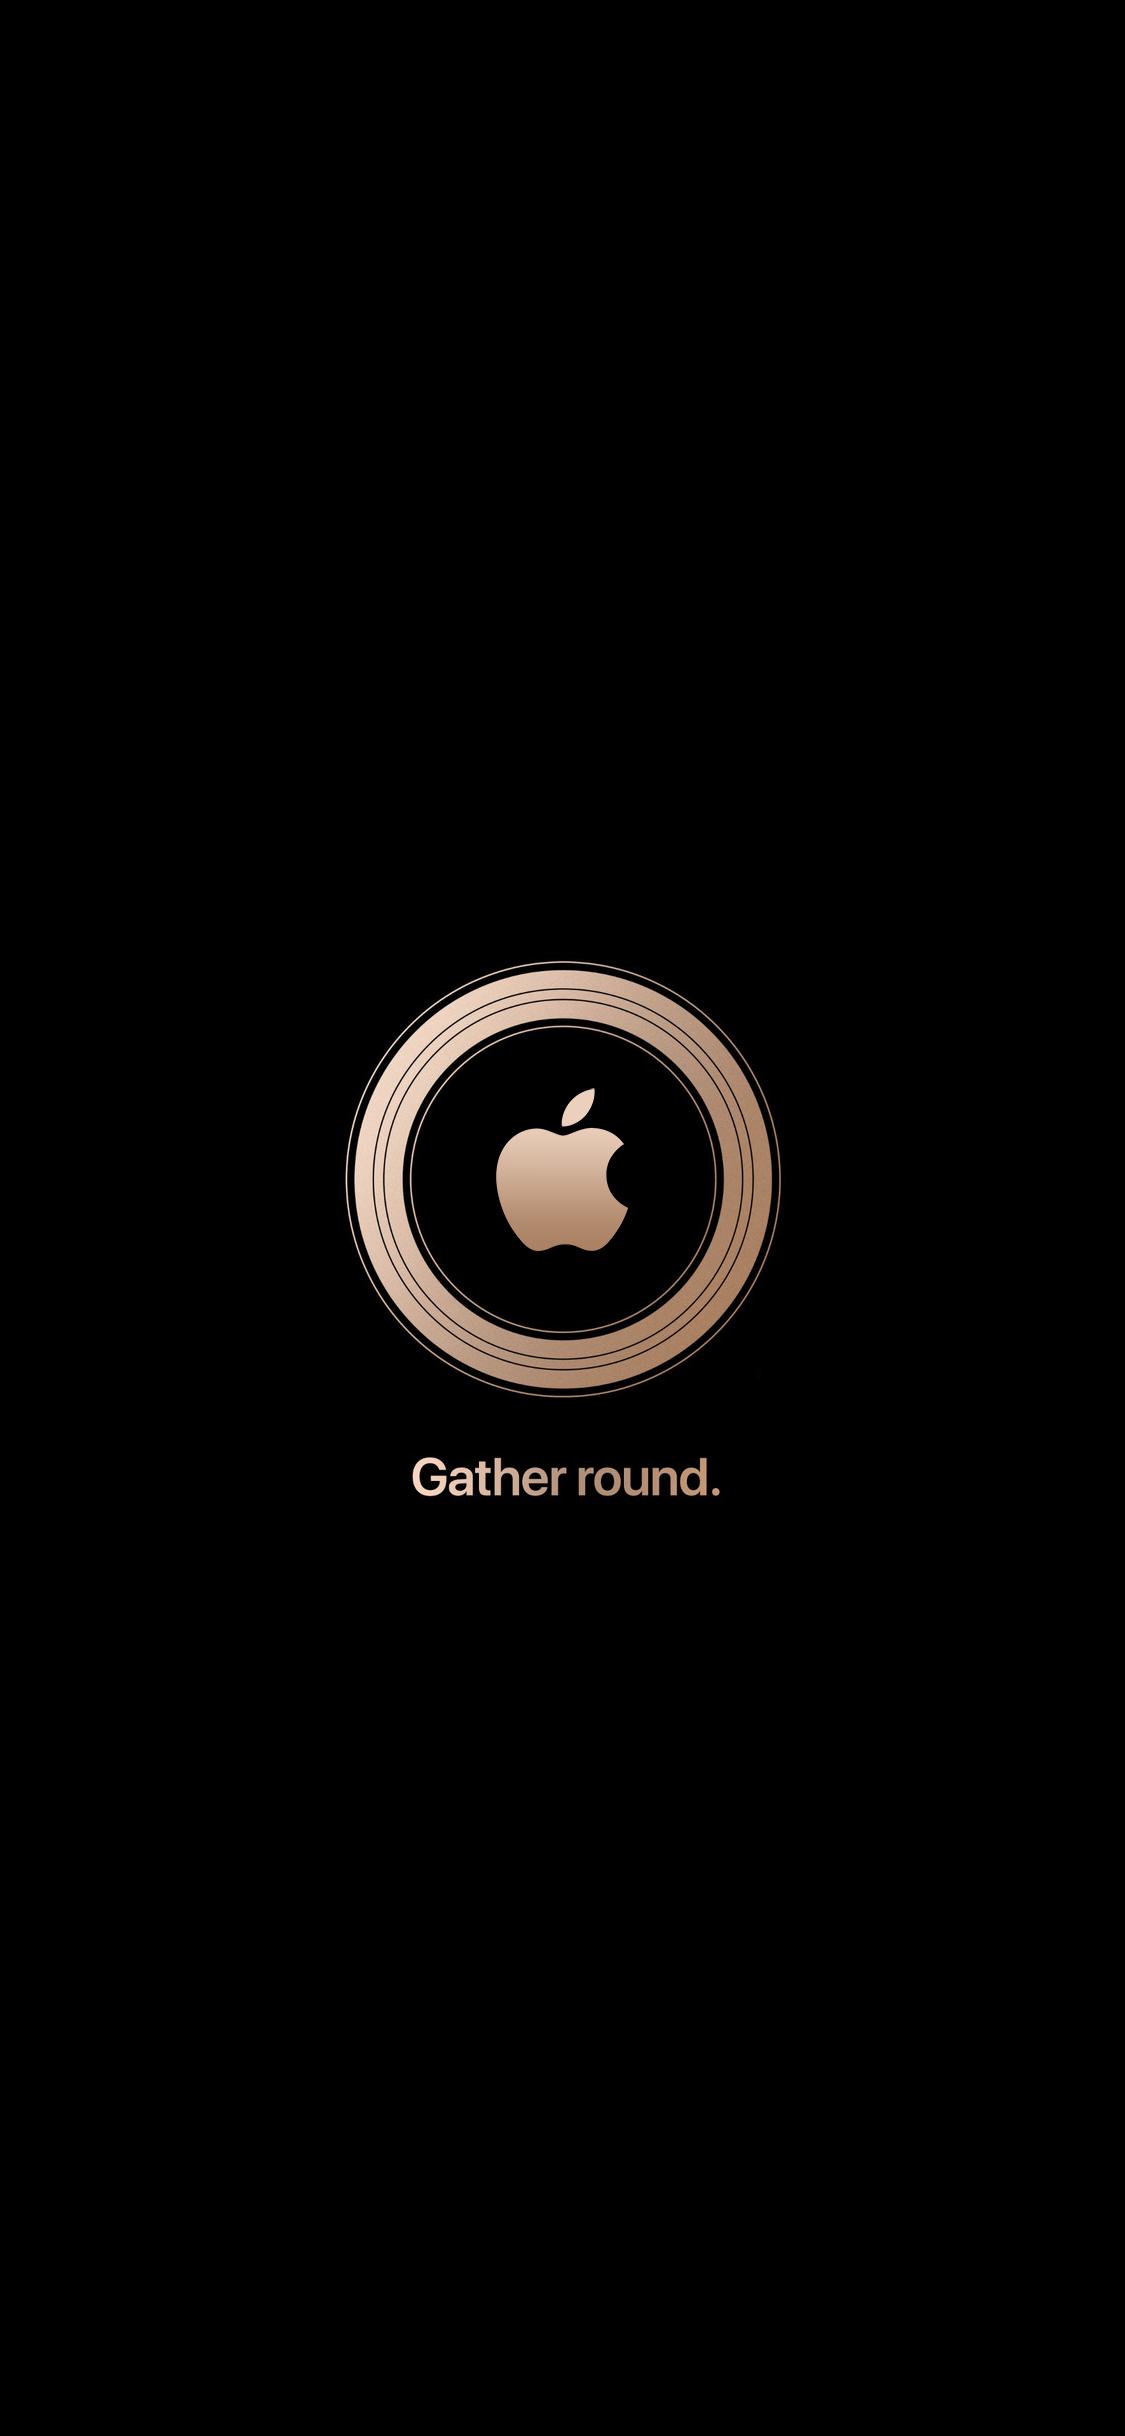 High Quality Apple Logo Wallpaper Iphone X